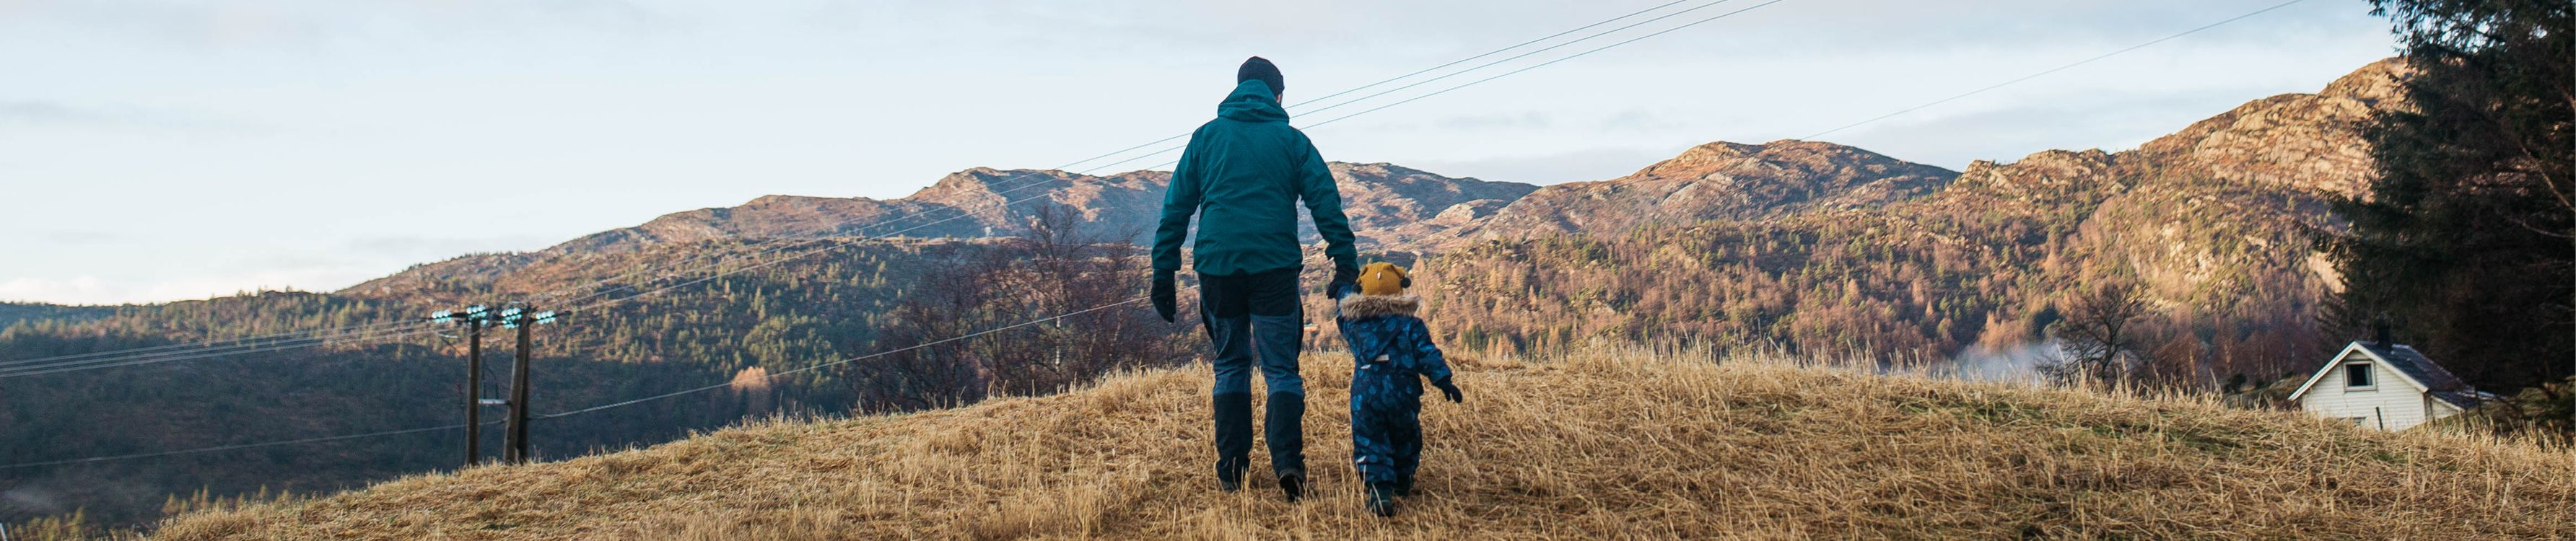 Illustrasjonsfoto: Mann går sammen med barn